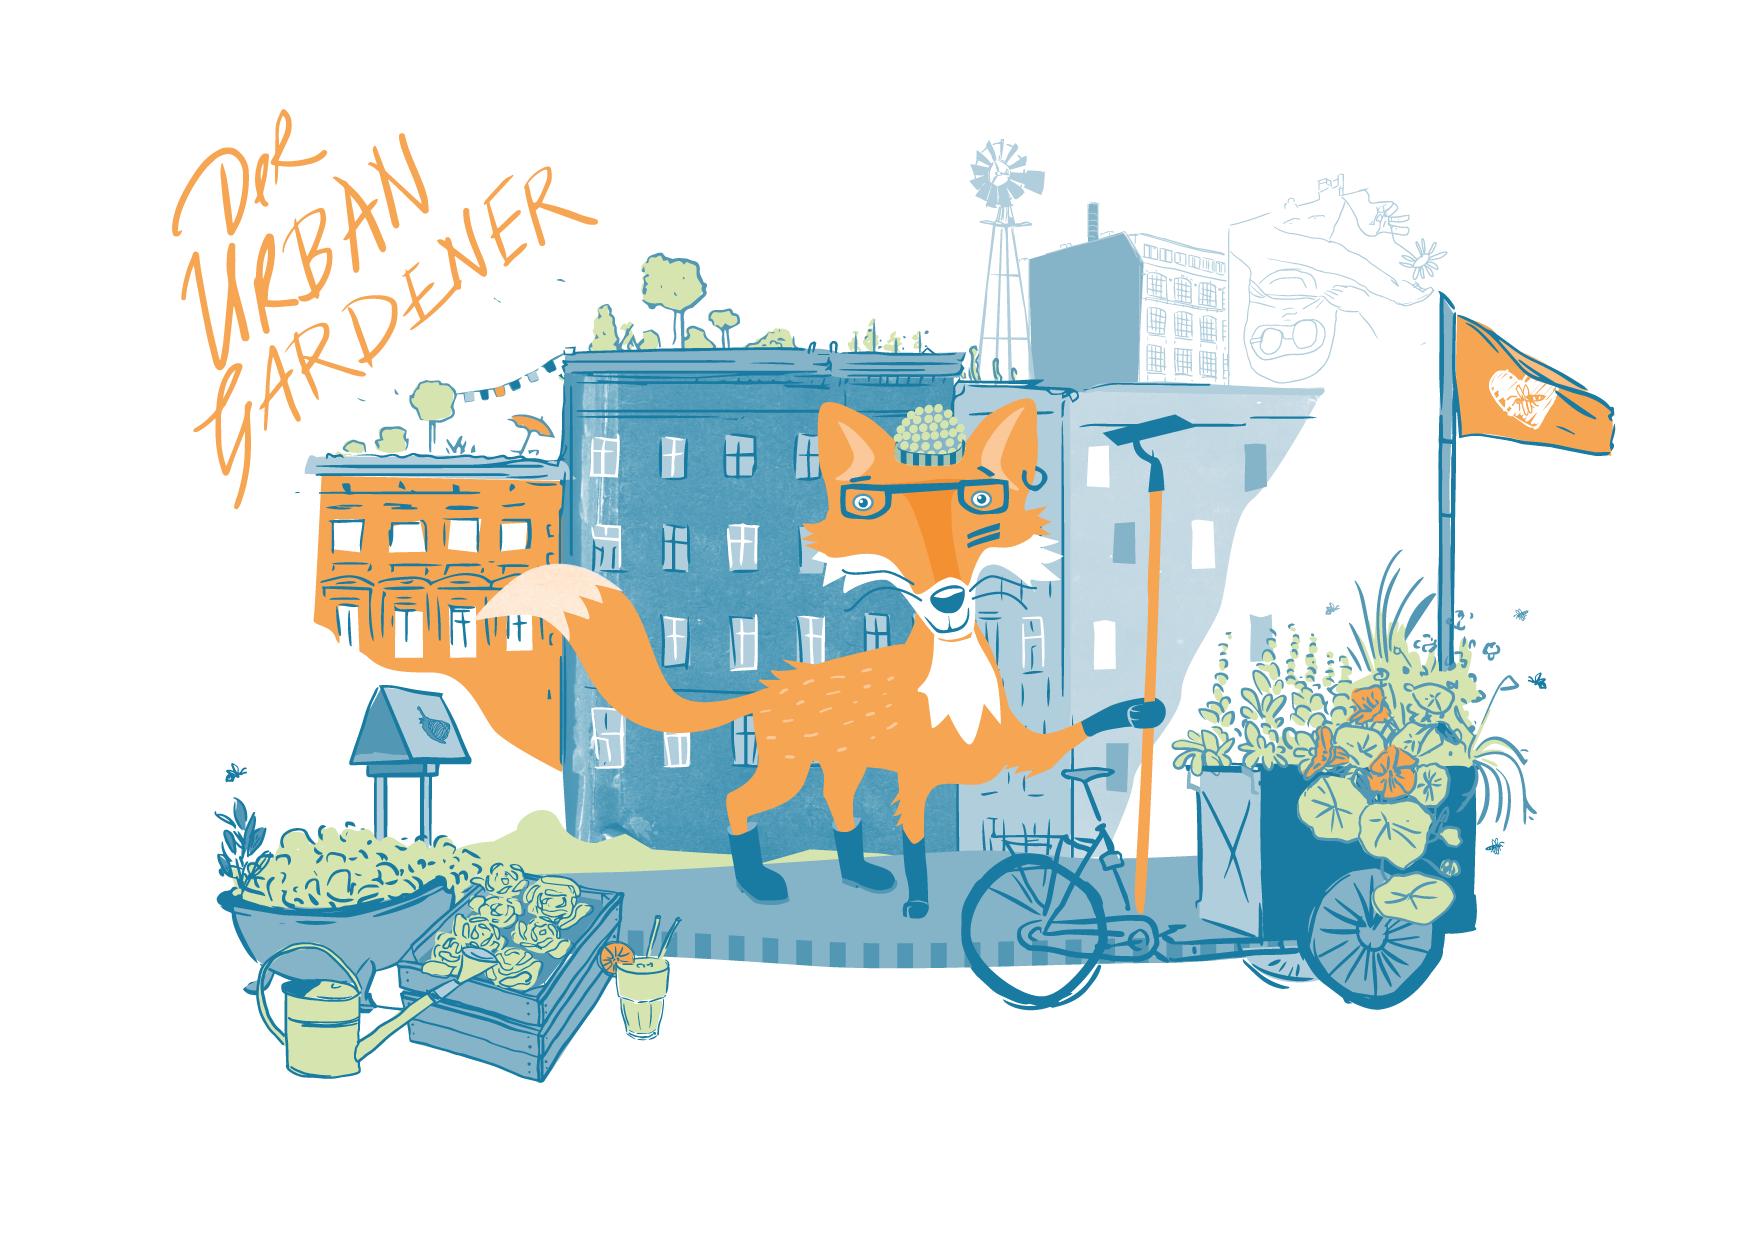 Der Stadtgärtner // The Urban Gardener